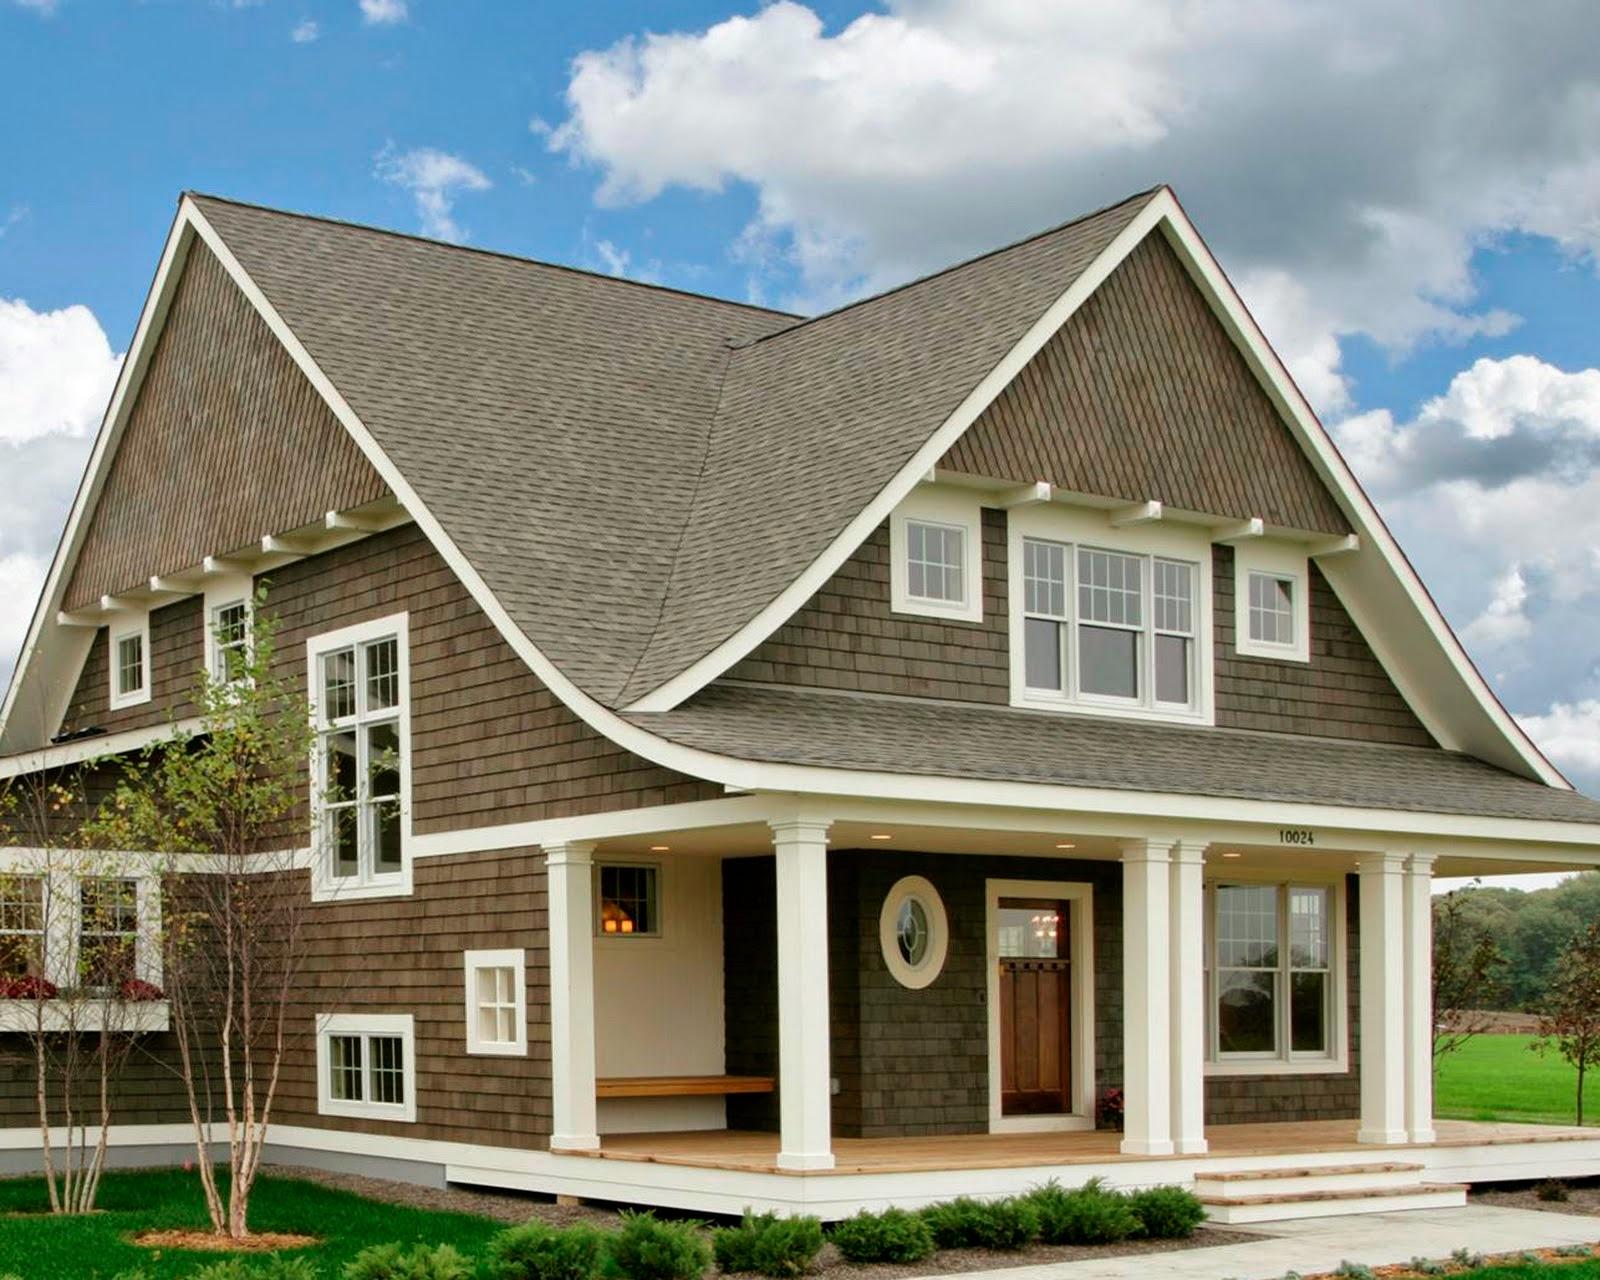 Big Design Ideas for Small Houses | Northwest Arkansas Home Builders ...